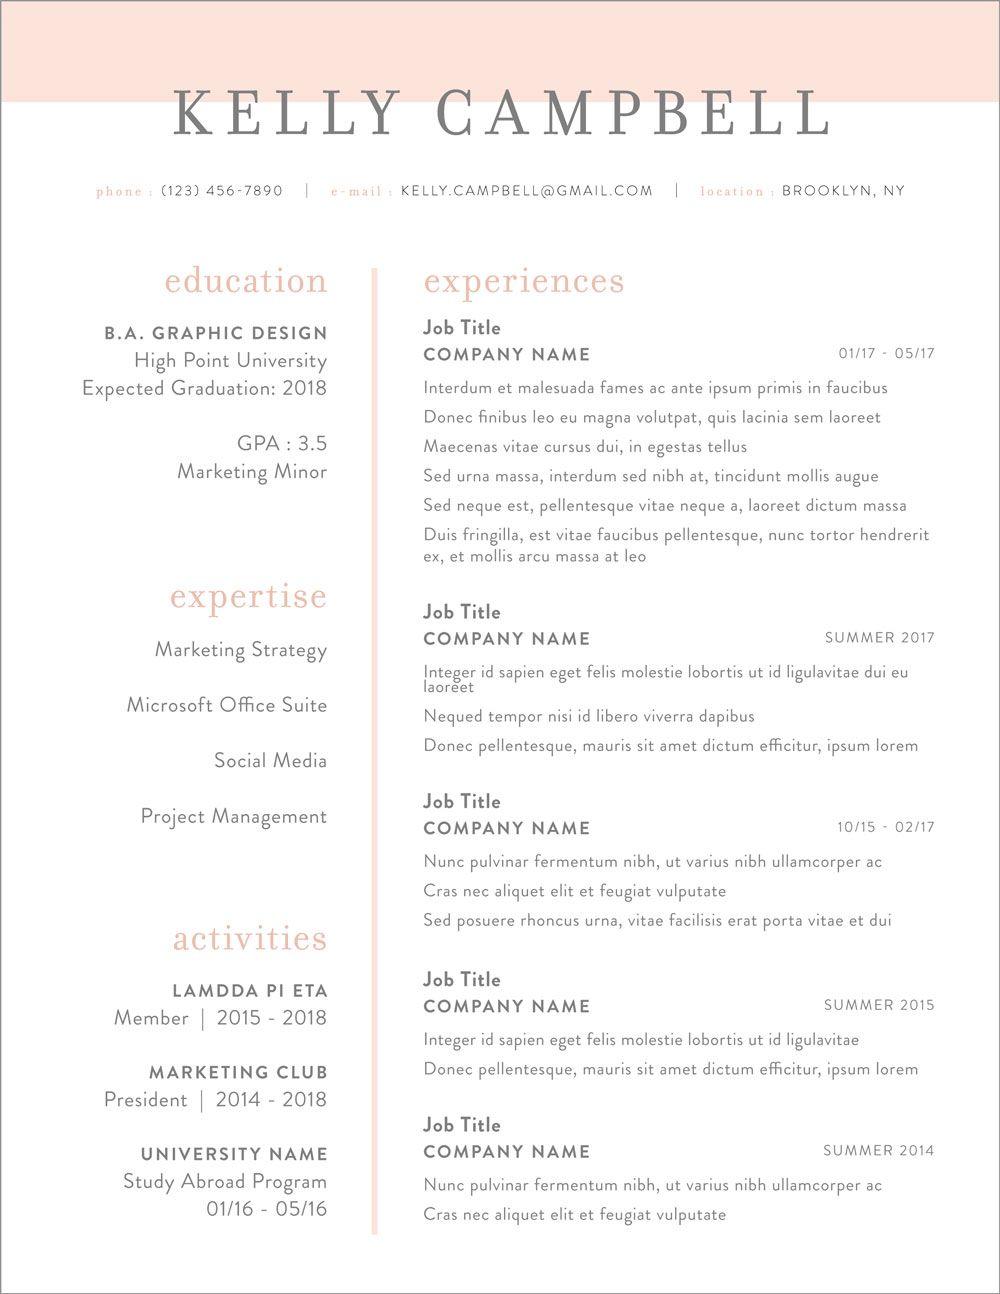 résumé + cover letter templates resume sample cv for grad school application structural engineer simple format accountant